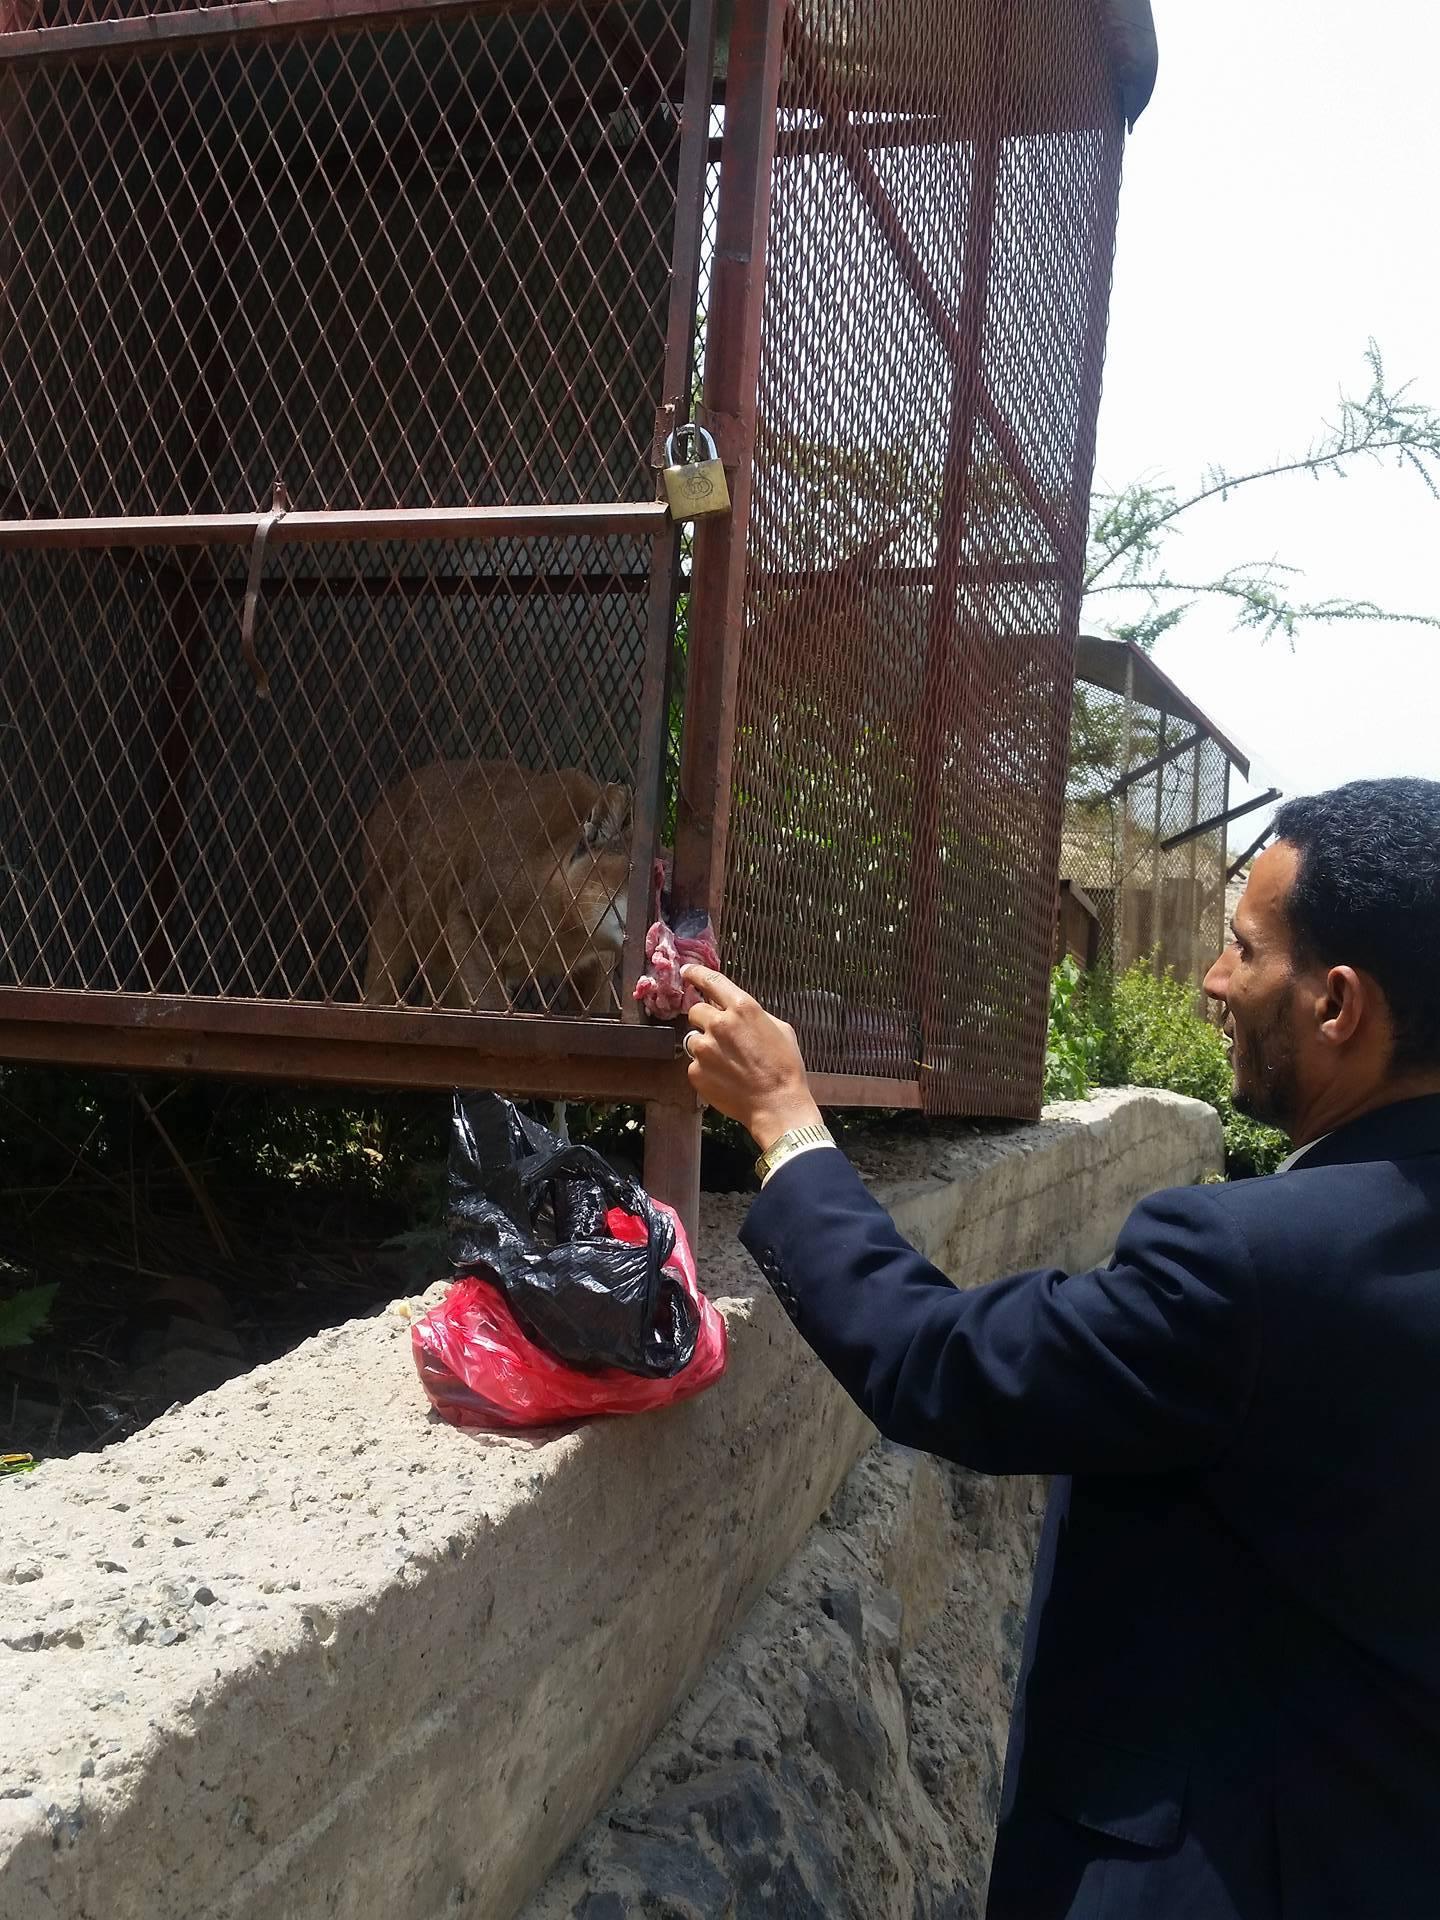 Ibb Zoo Omar feeding wildcat 23 July 2017 Kim's Emergency  Rescue Yemen.jpg